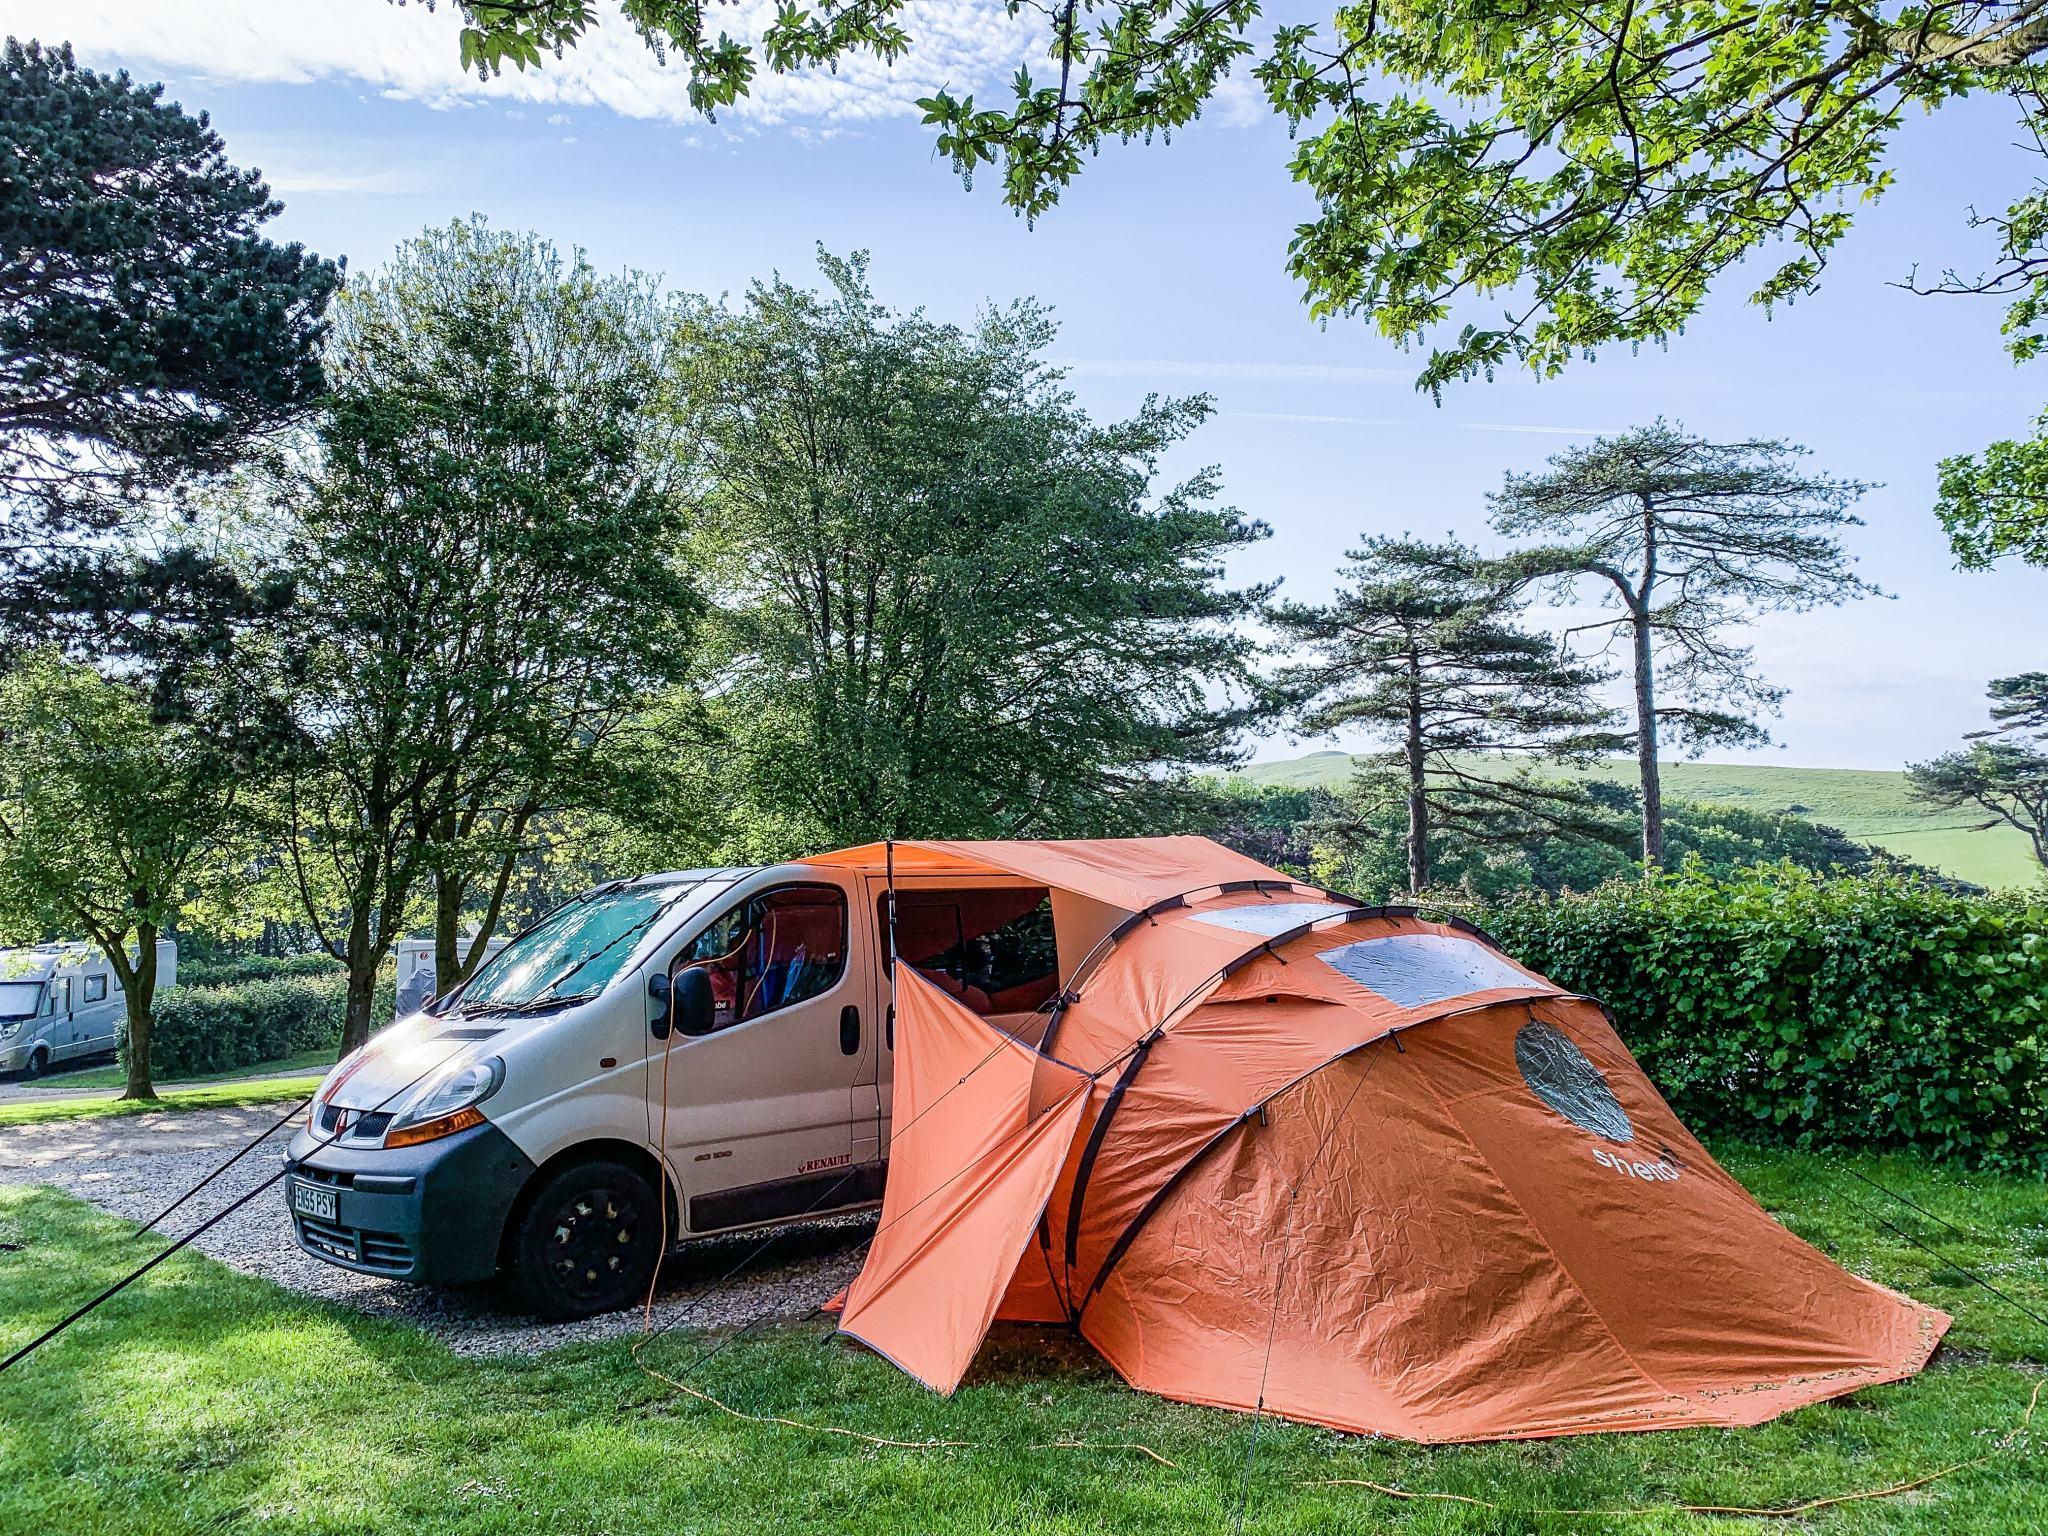 renault trafic camper van and sheltapod